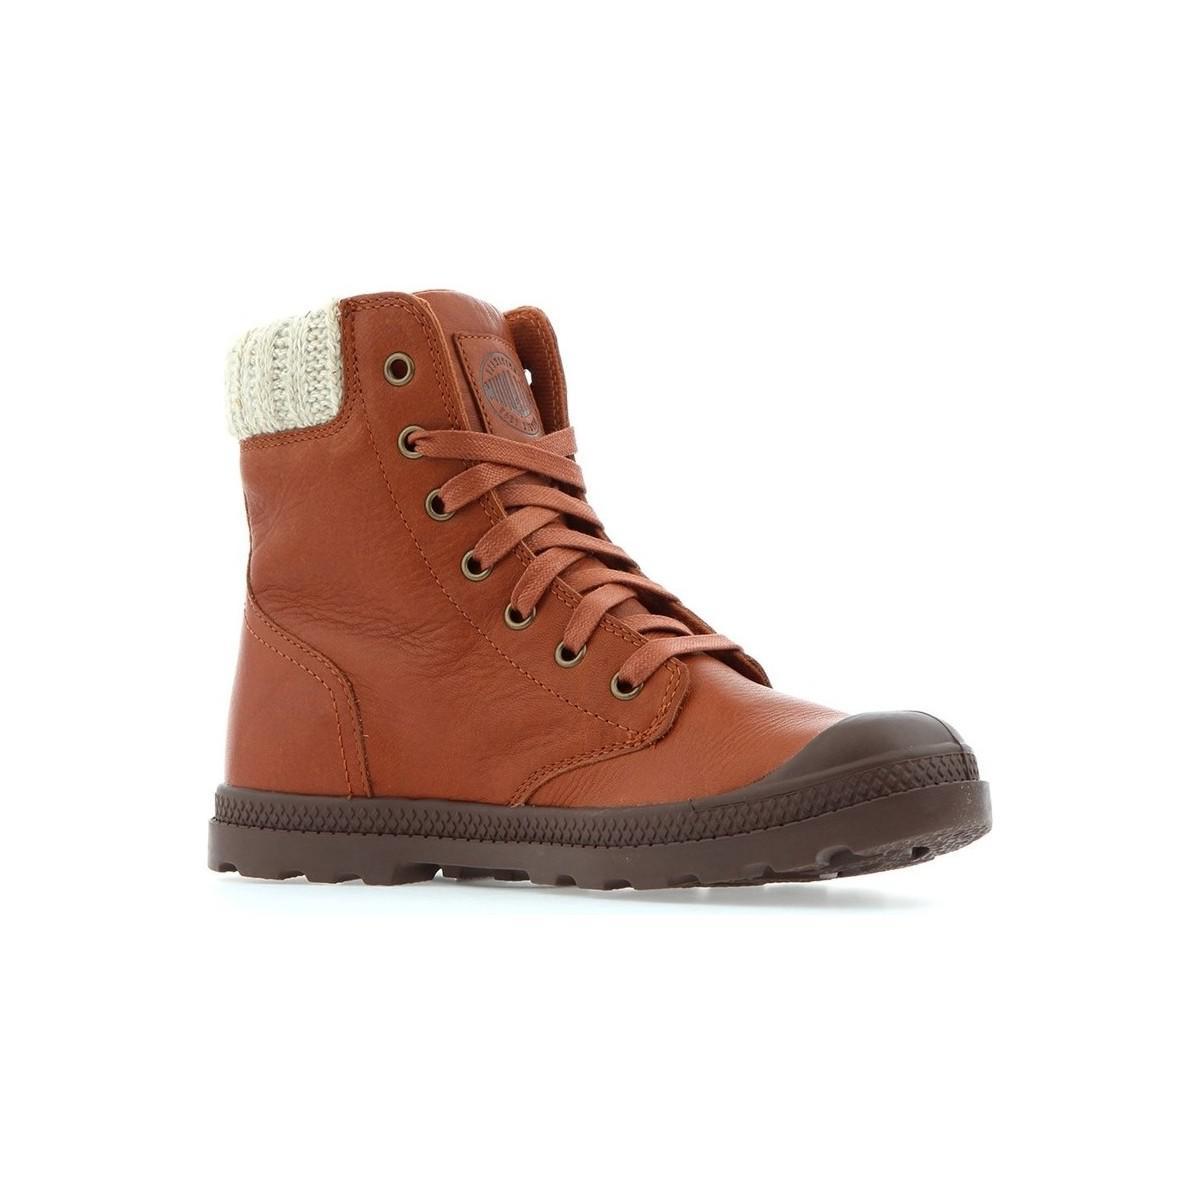 Palladium Pampa Hi Knit Lp Women s Mid Boots In Brown in Brown ... eec78dfc385b